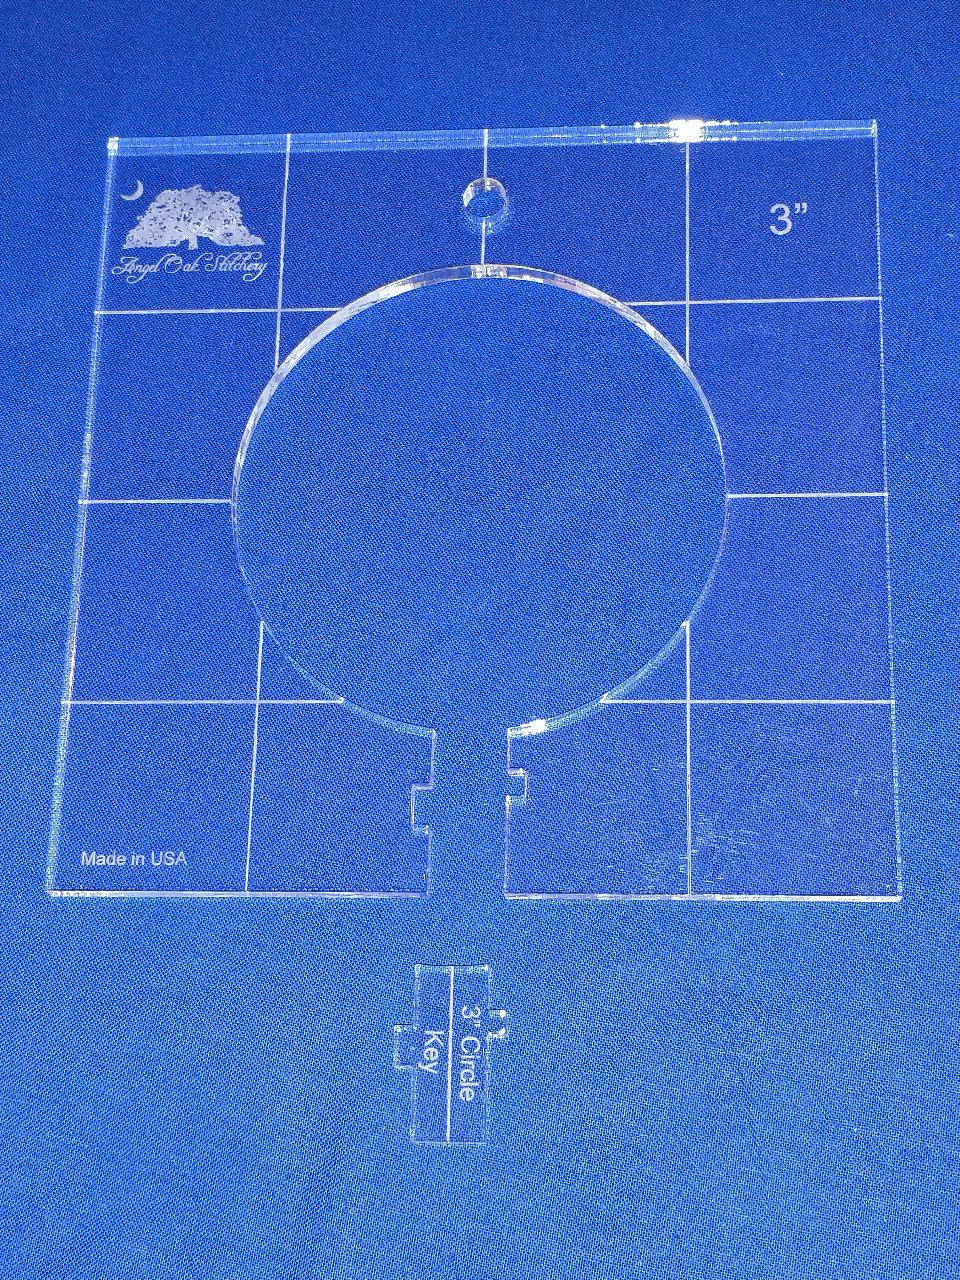 3 inch Circle Rulerwork Quilting Template